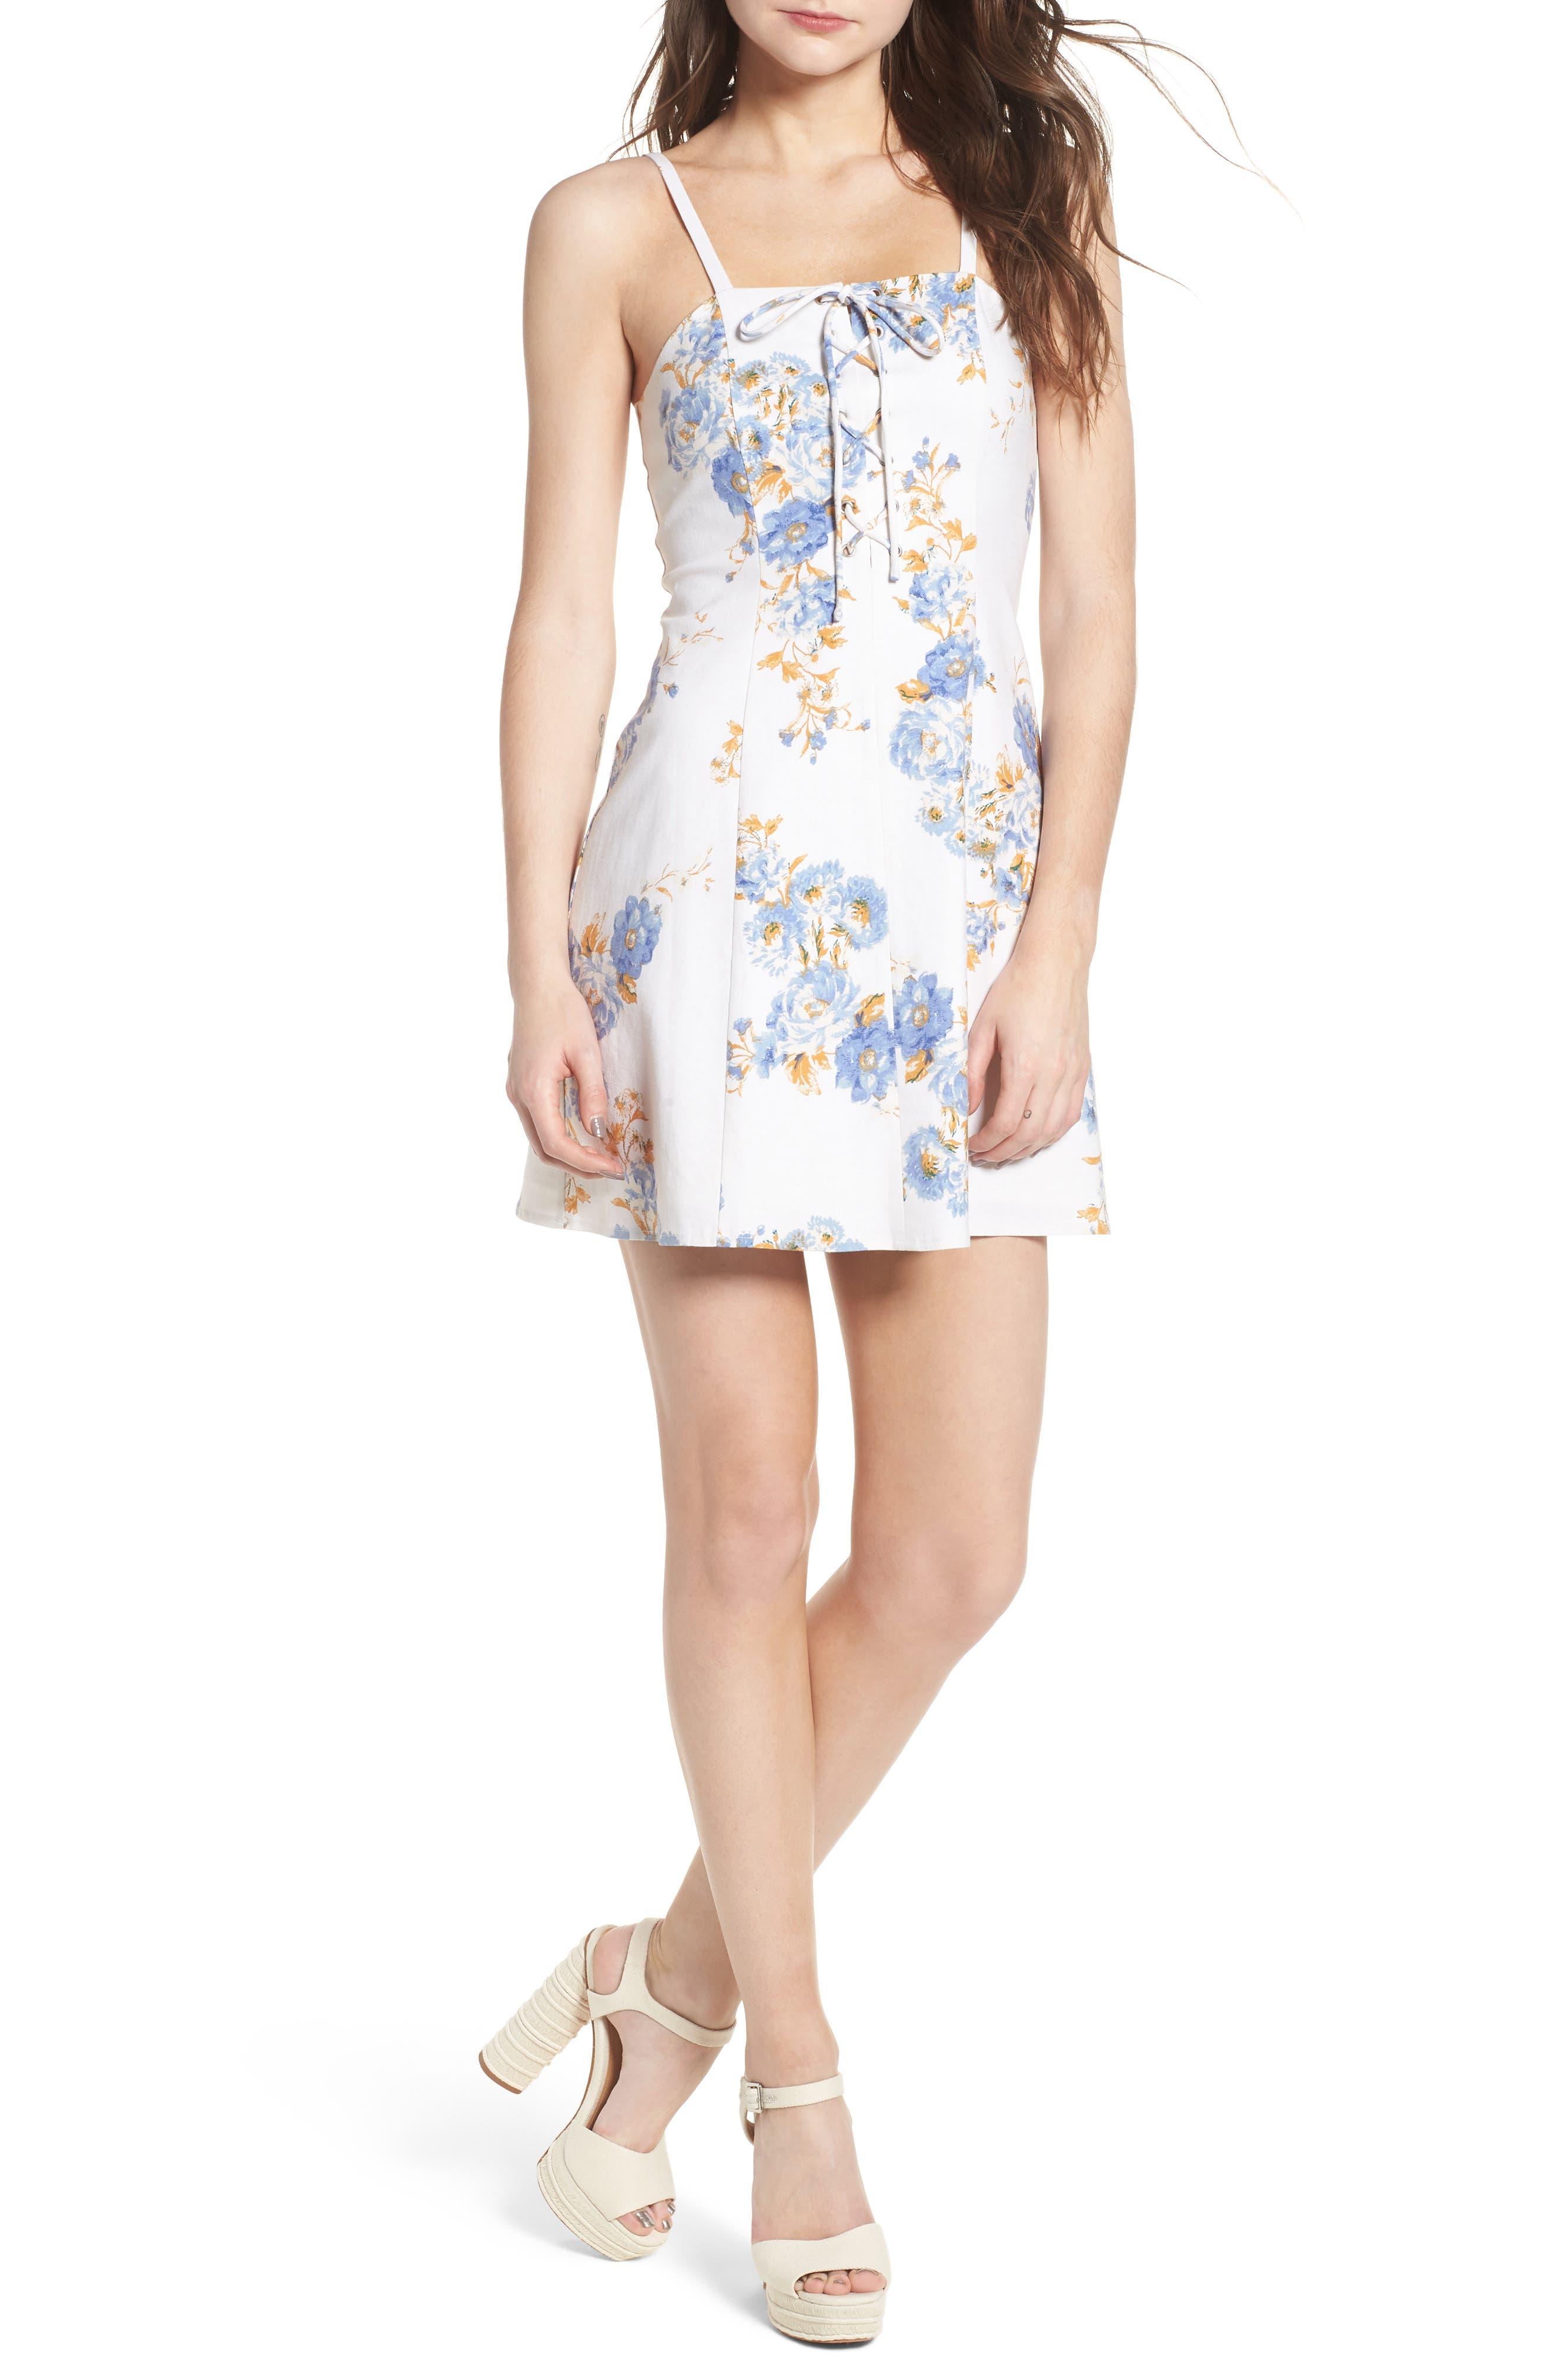 Modena Lace-Up Minidress,                             Main thumbnail 1, color,                             Ivory Floral